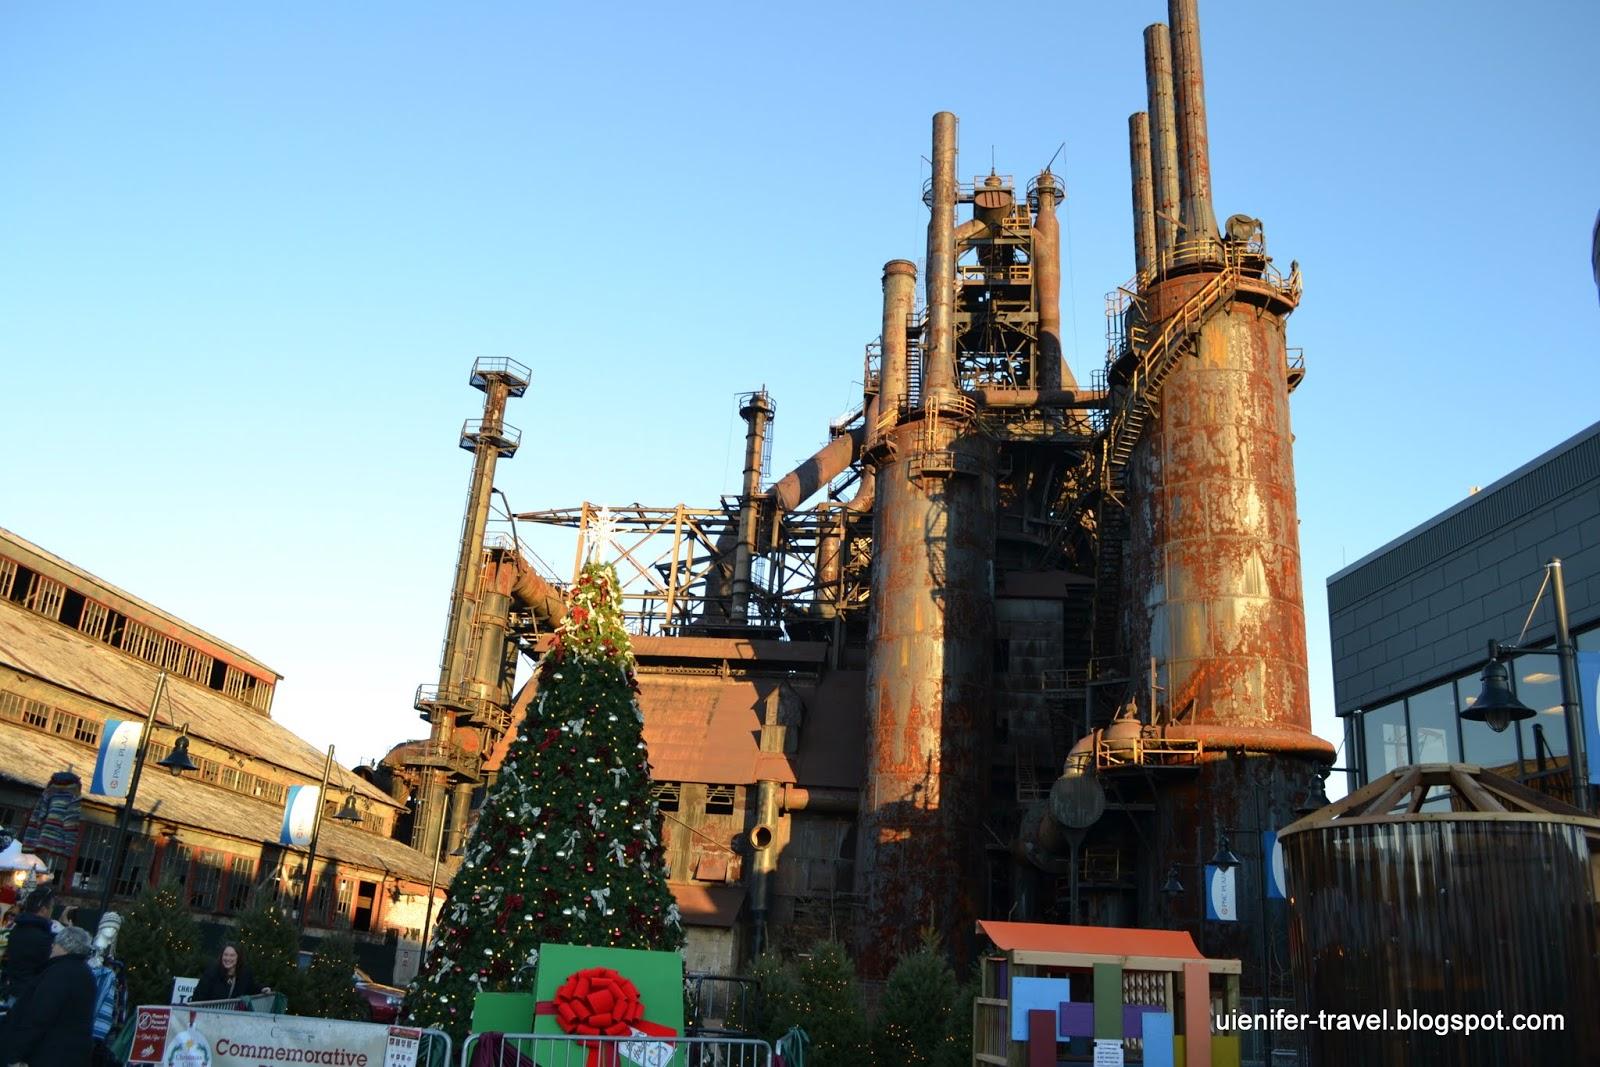 Завод Бетлехем Стил, Бетлехем, Пенсильвания (Bethlehem Steel, Bethlehem, Pennsylvania)